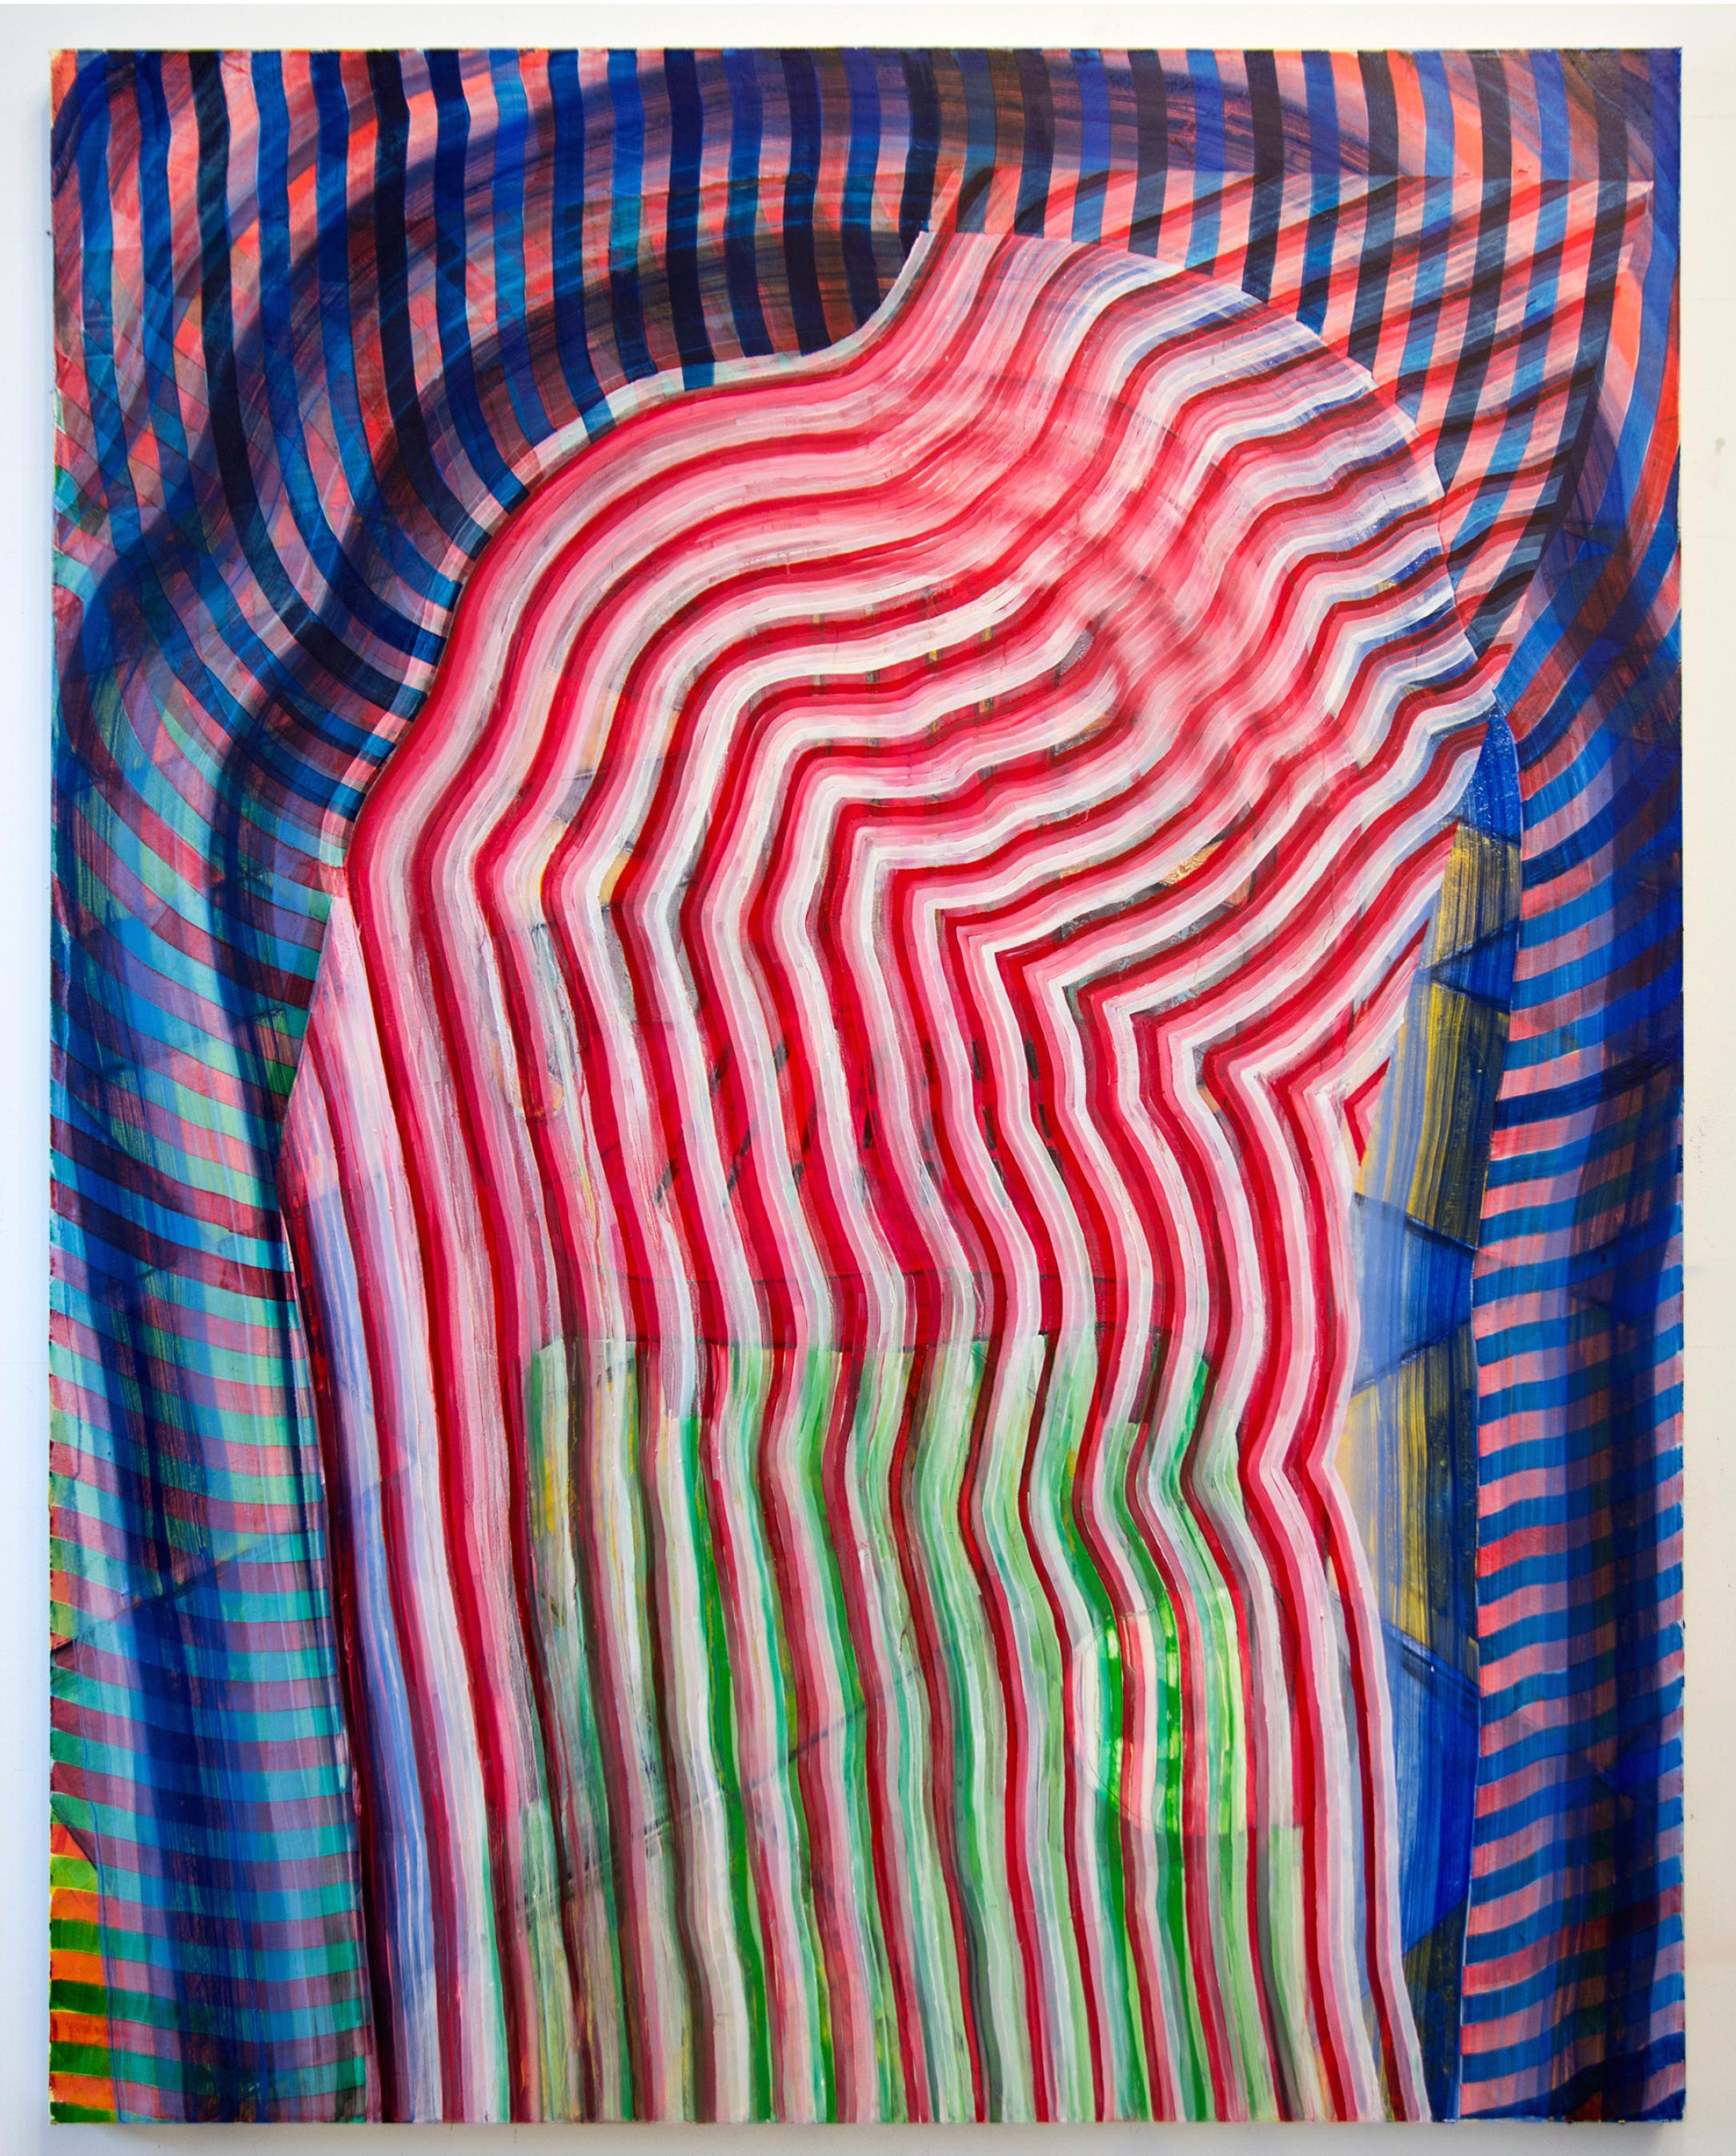 Mauricio Cortes Ortega,coca cola chair,2017,oil on canvas,60 x 48 in.